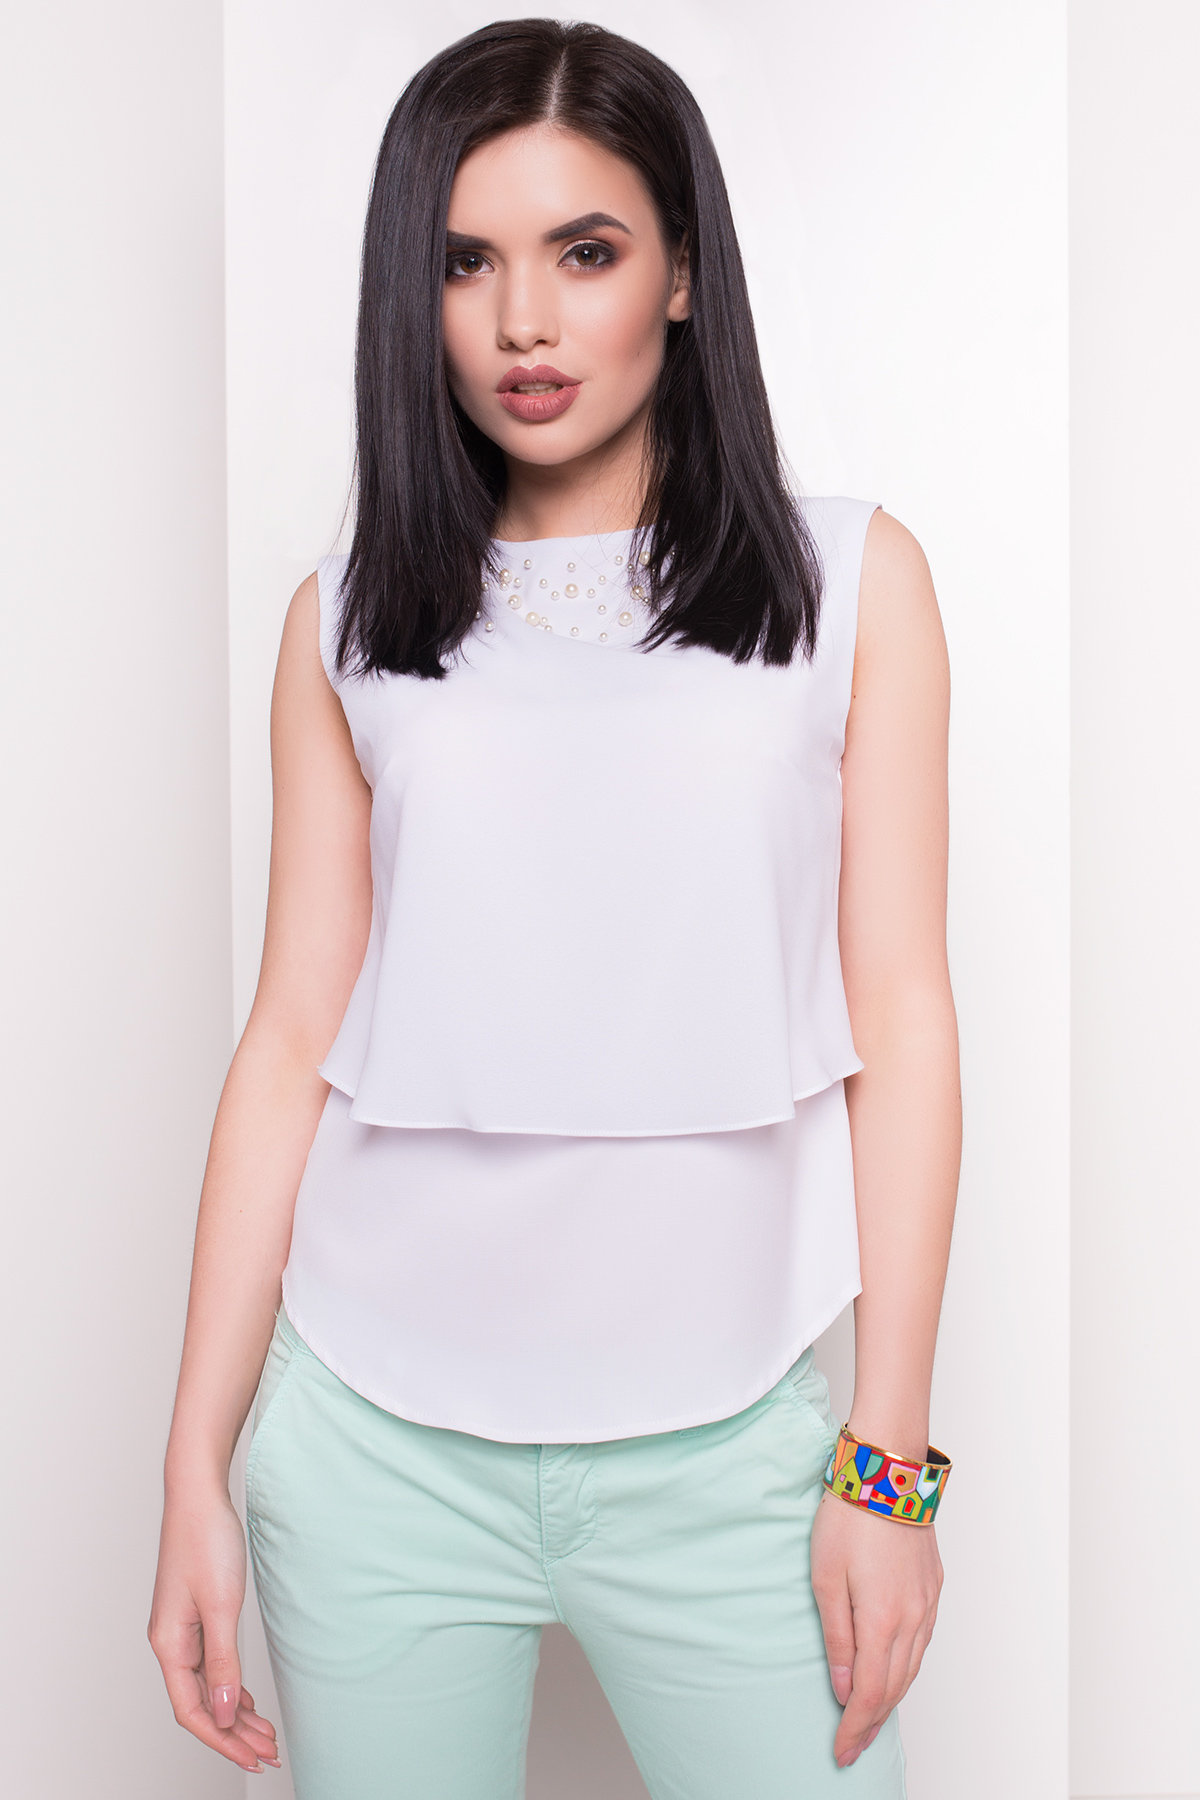 Блузка Арома жемчуг 2960 Цвет: Белый